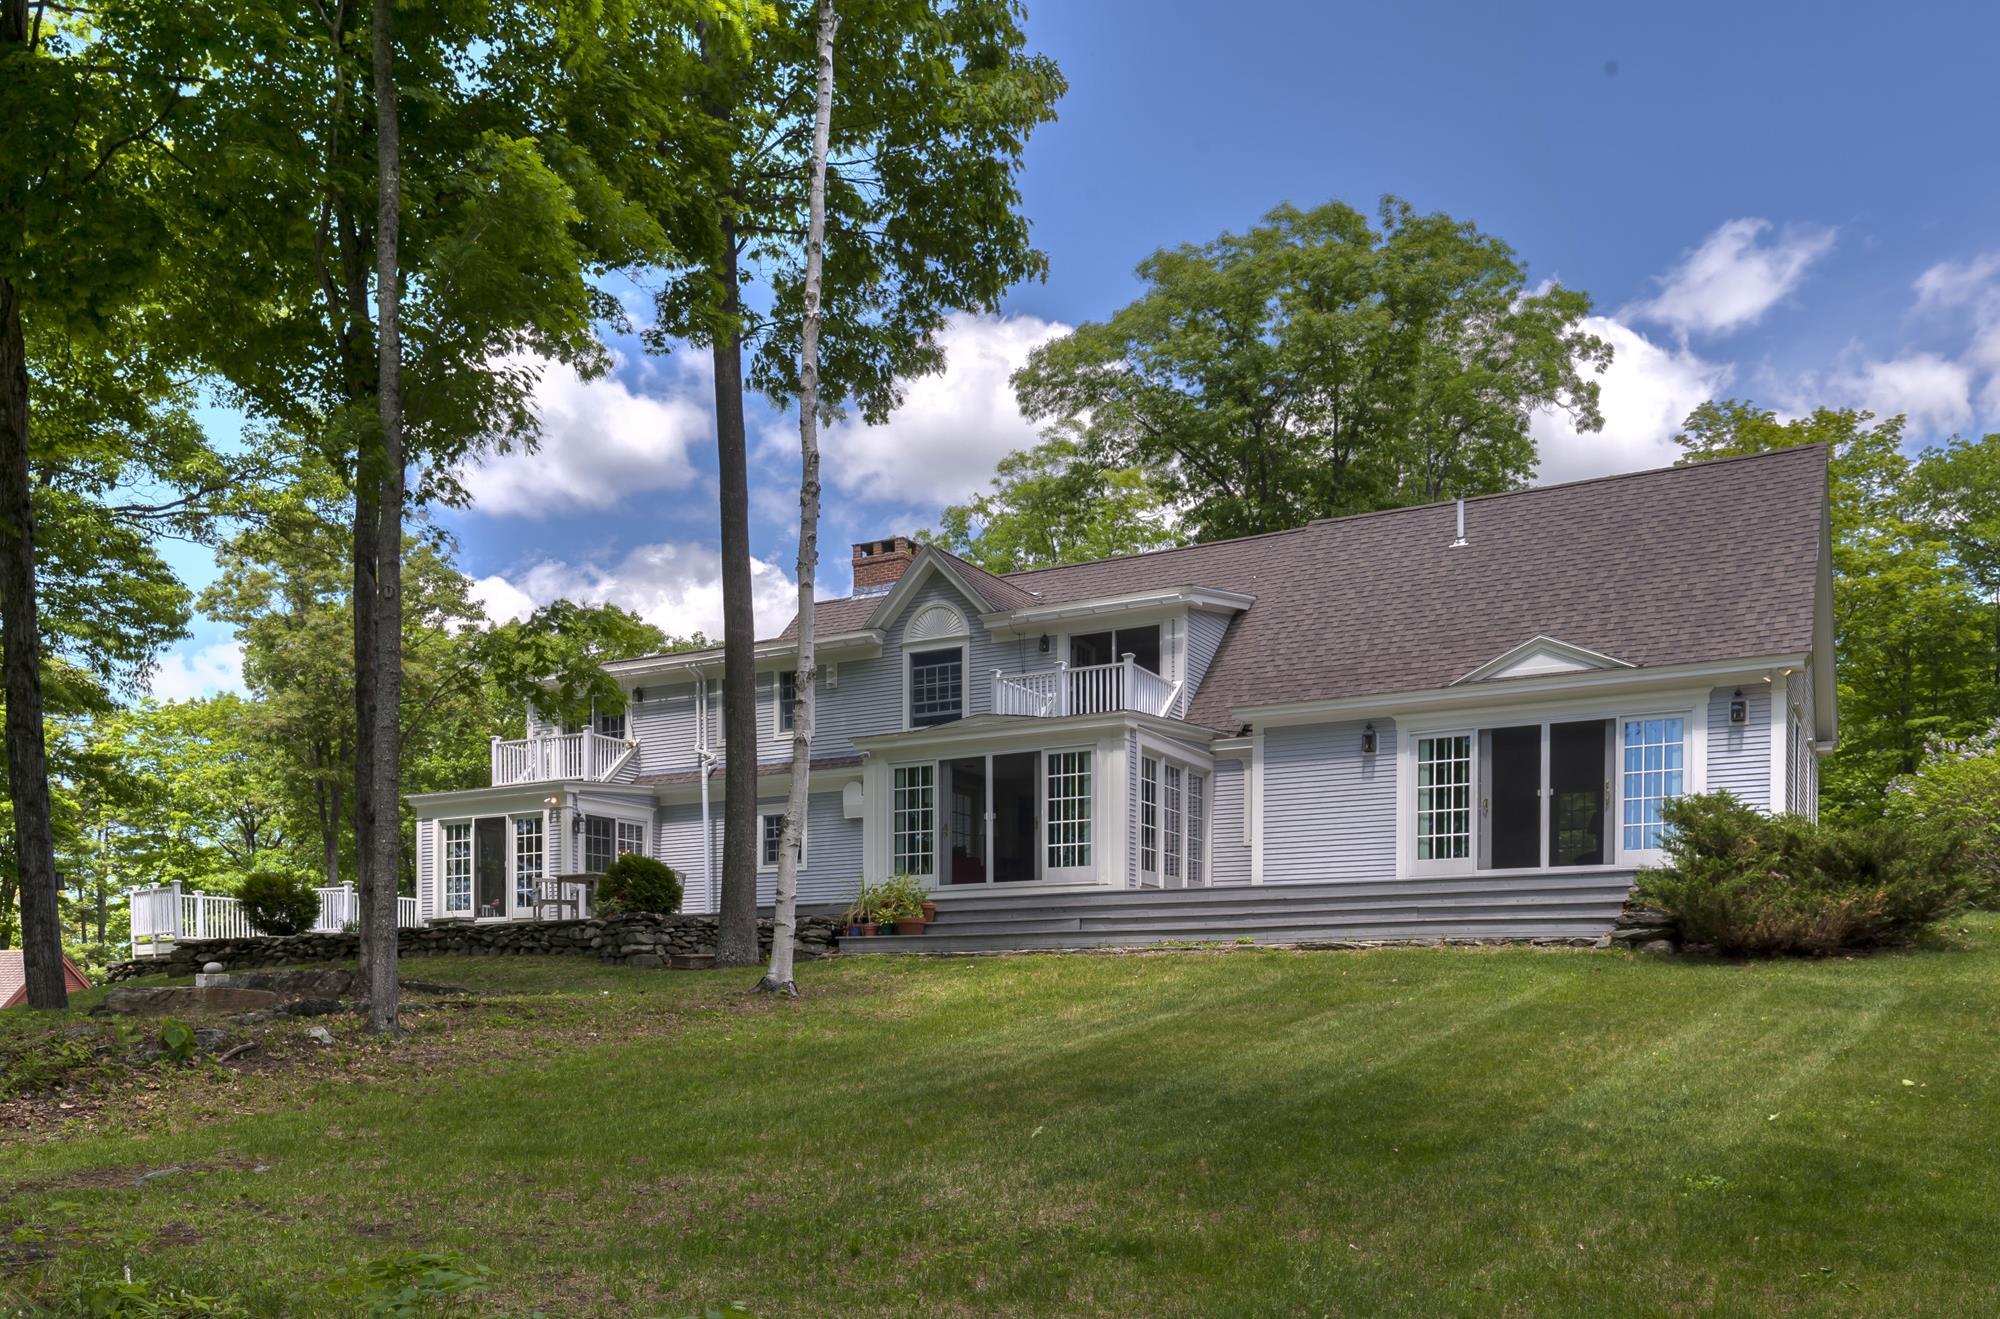 Single Family Home for Sale at Columbus Jordan Road, Plainfield Columbus Jordan Rd Plainfield, New Hampshire 03770 United States